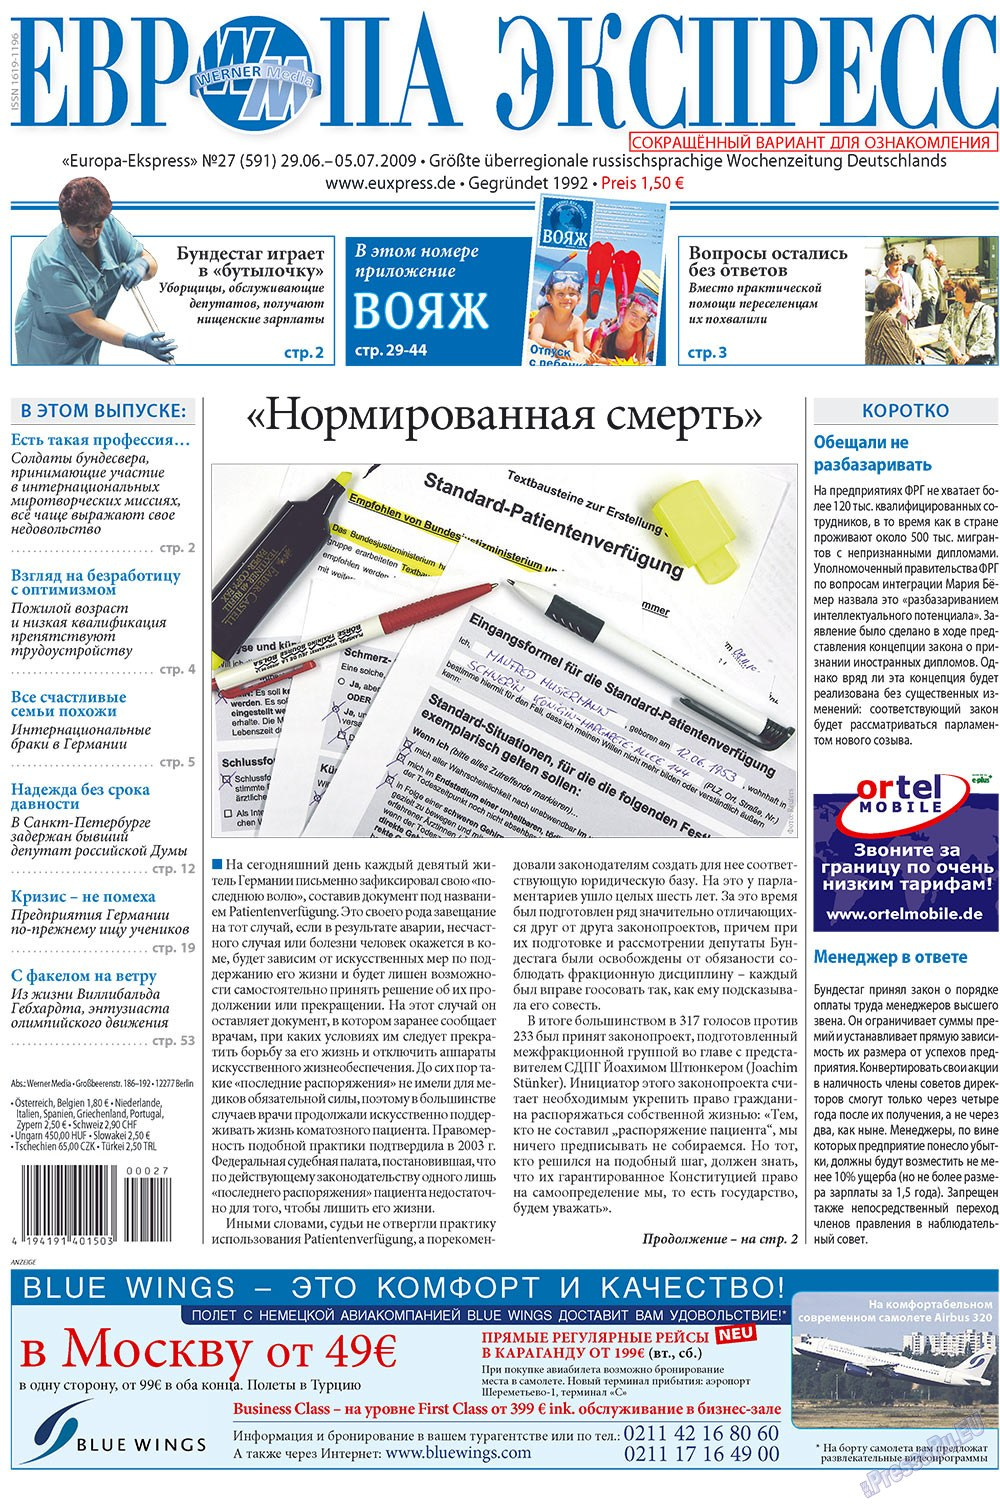 Европа экспресс (газета). 2009 год, номер 27, стр. 1